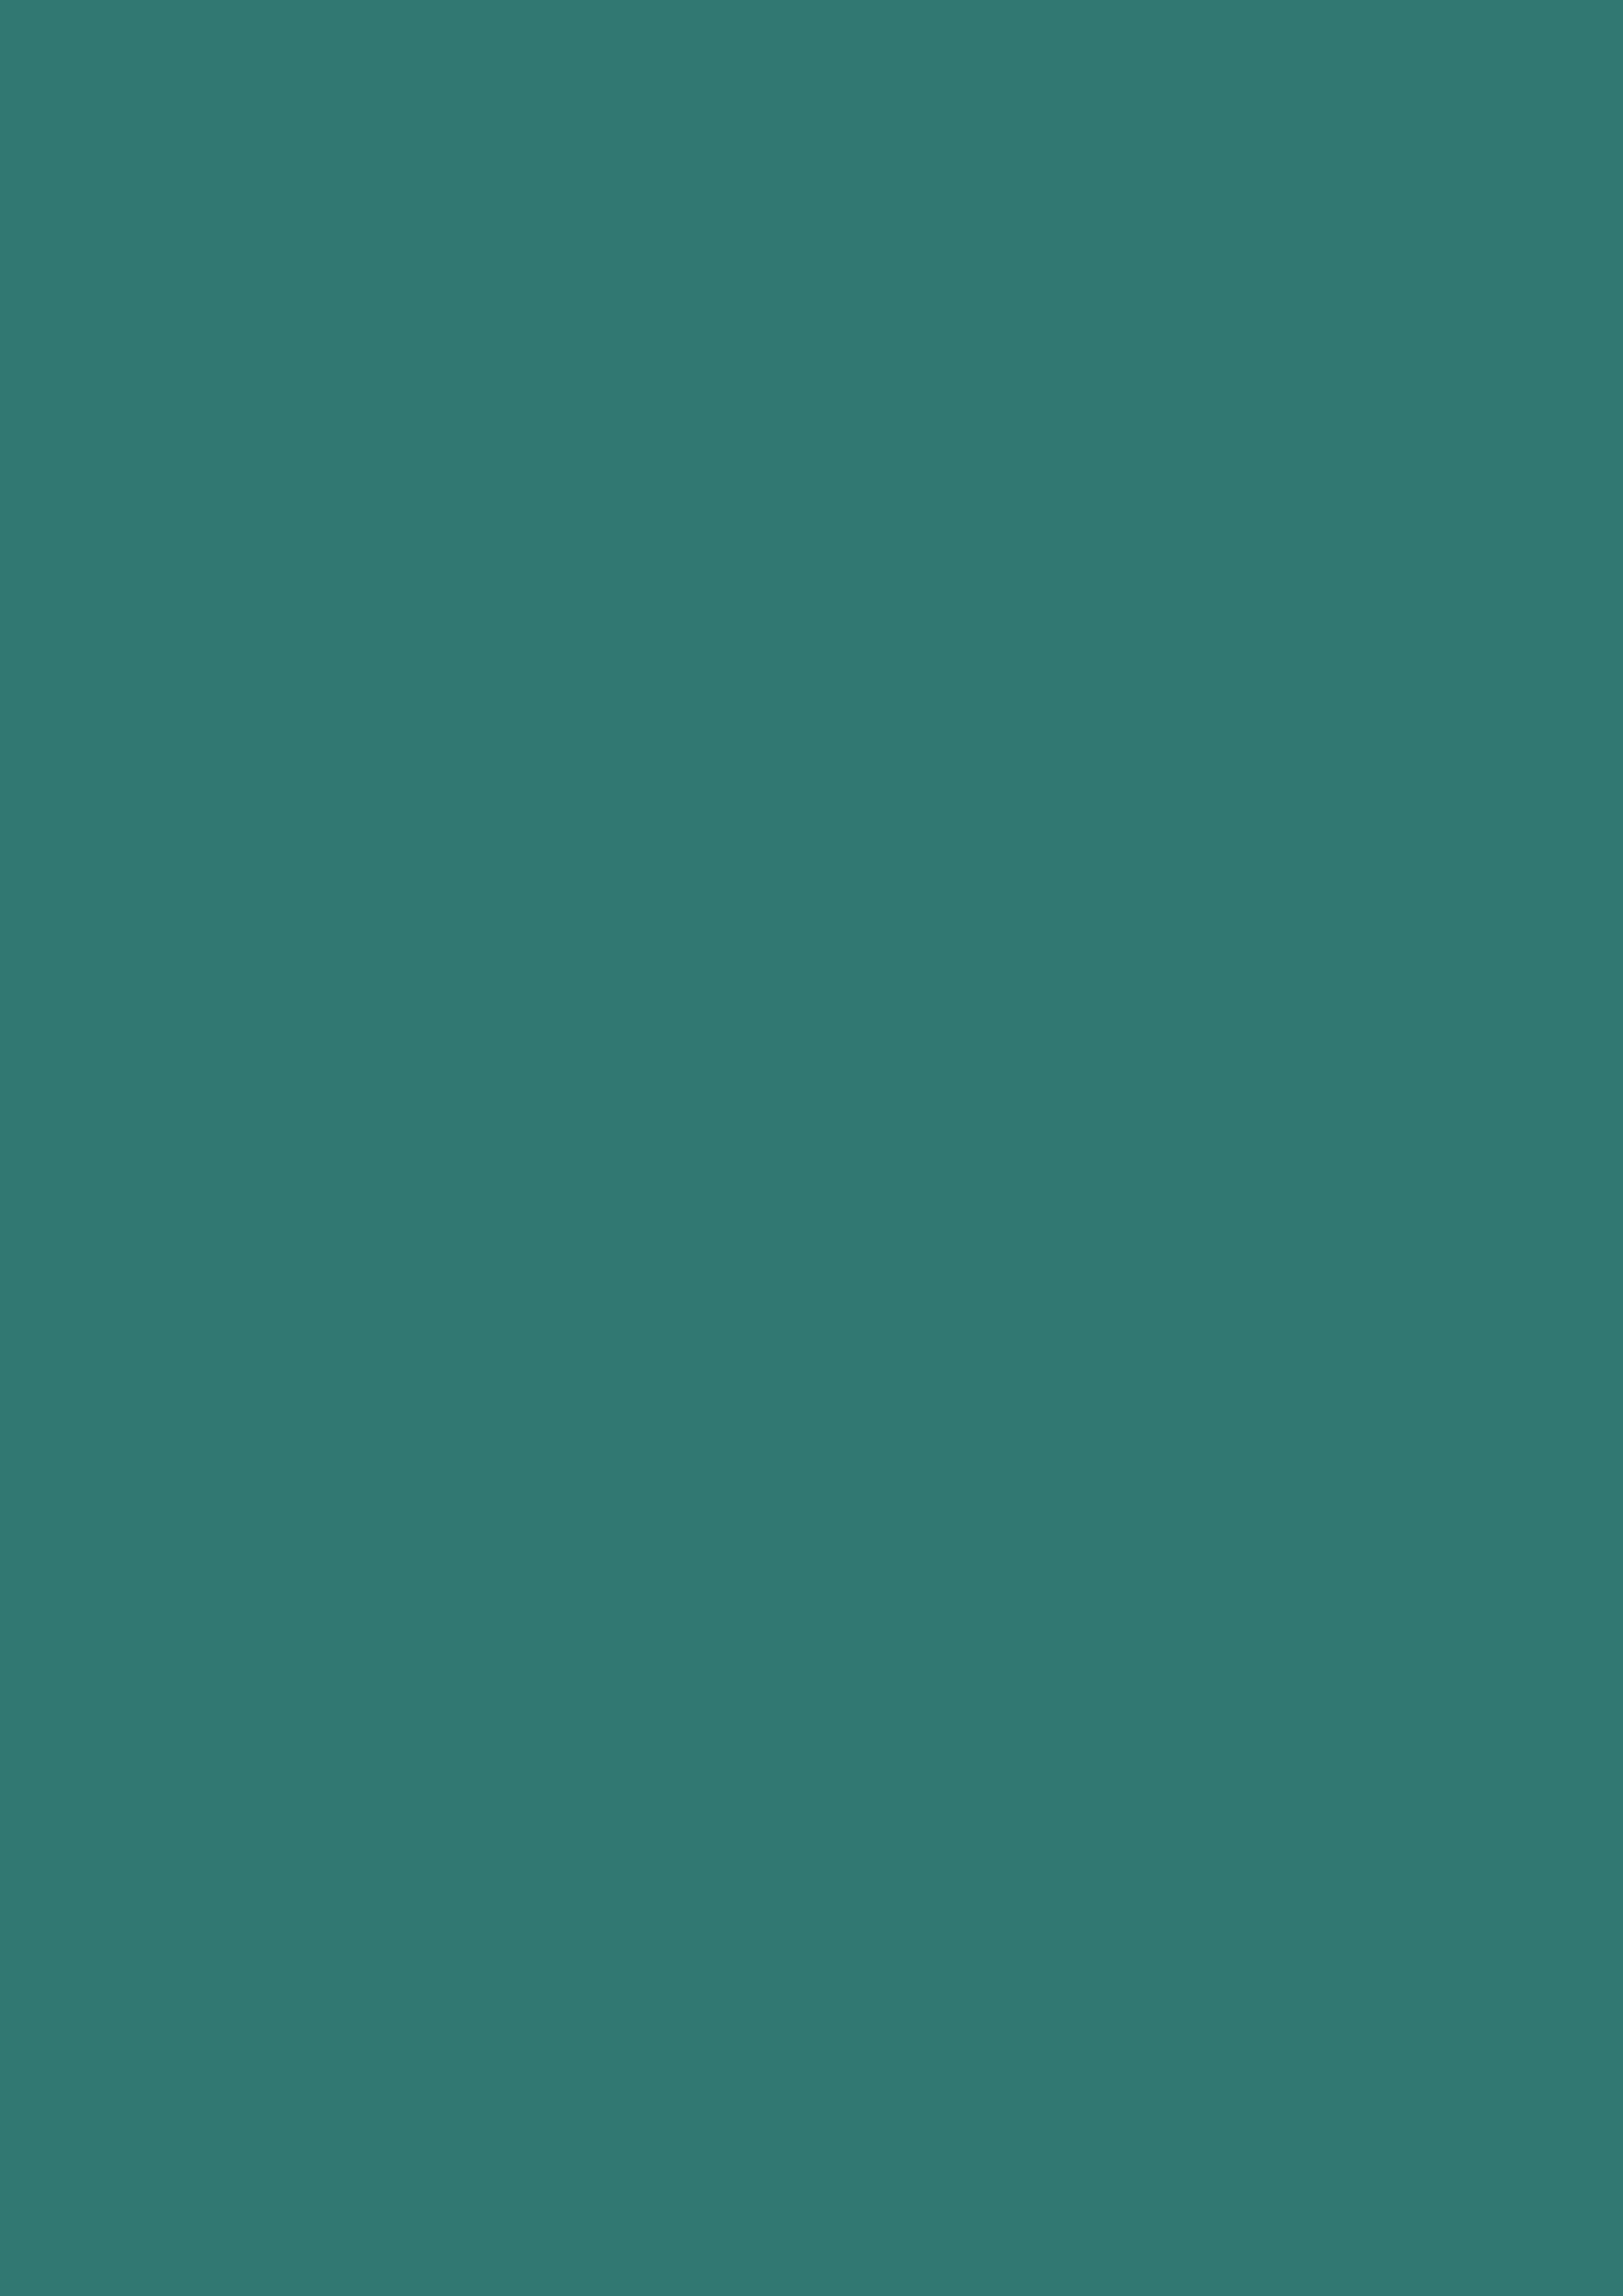 2480x3508 Myrtle Green Solid Color Background